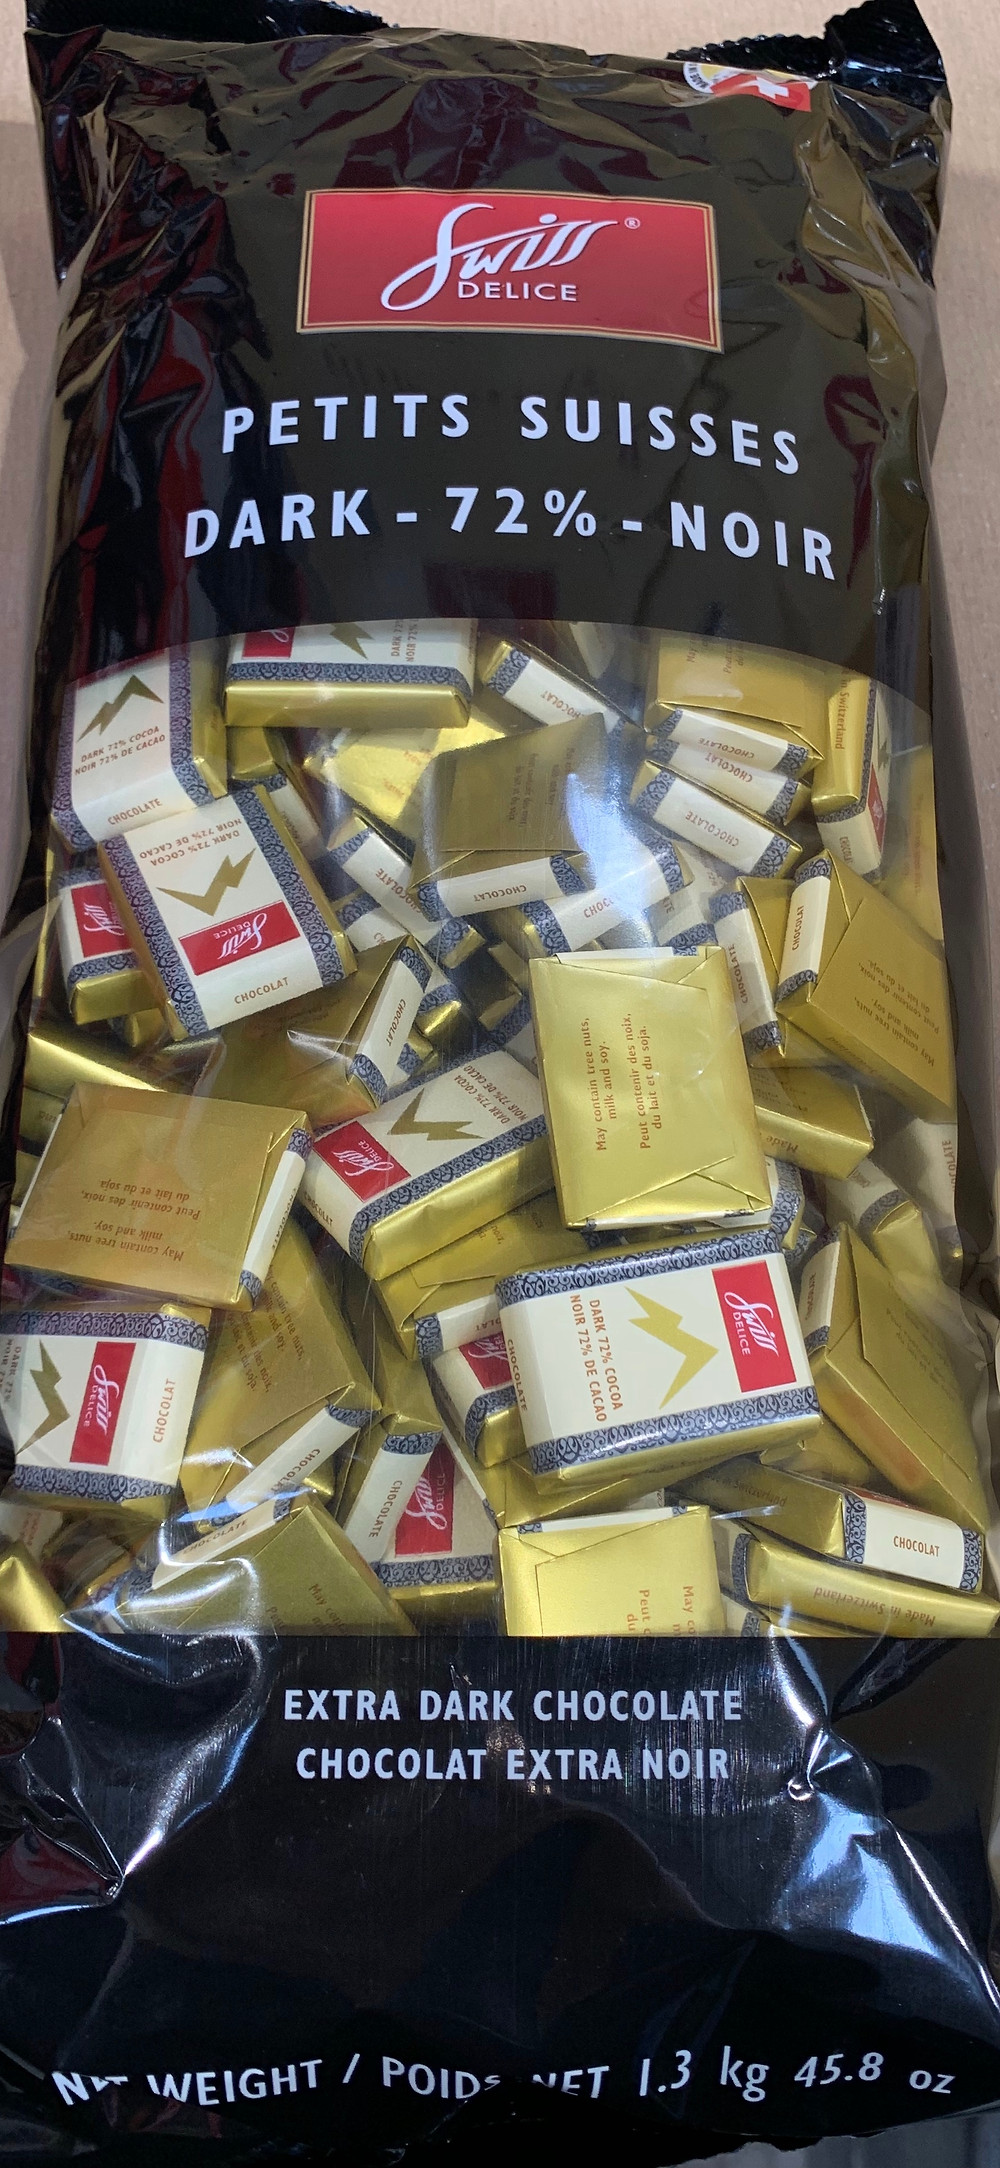 Costco Swiss Delice Petits Suisses Extra Dark Chocolate